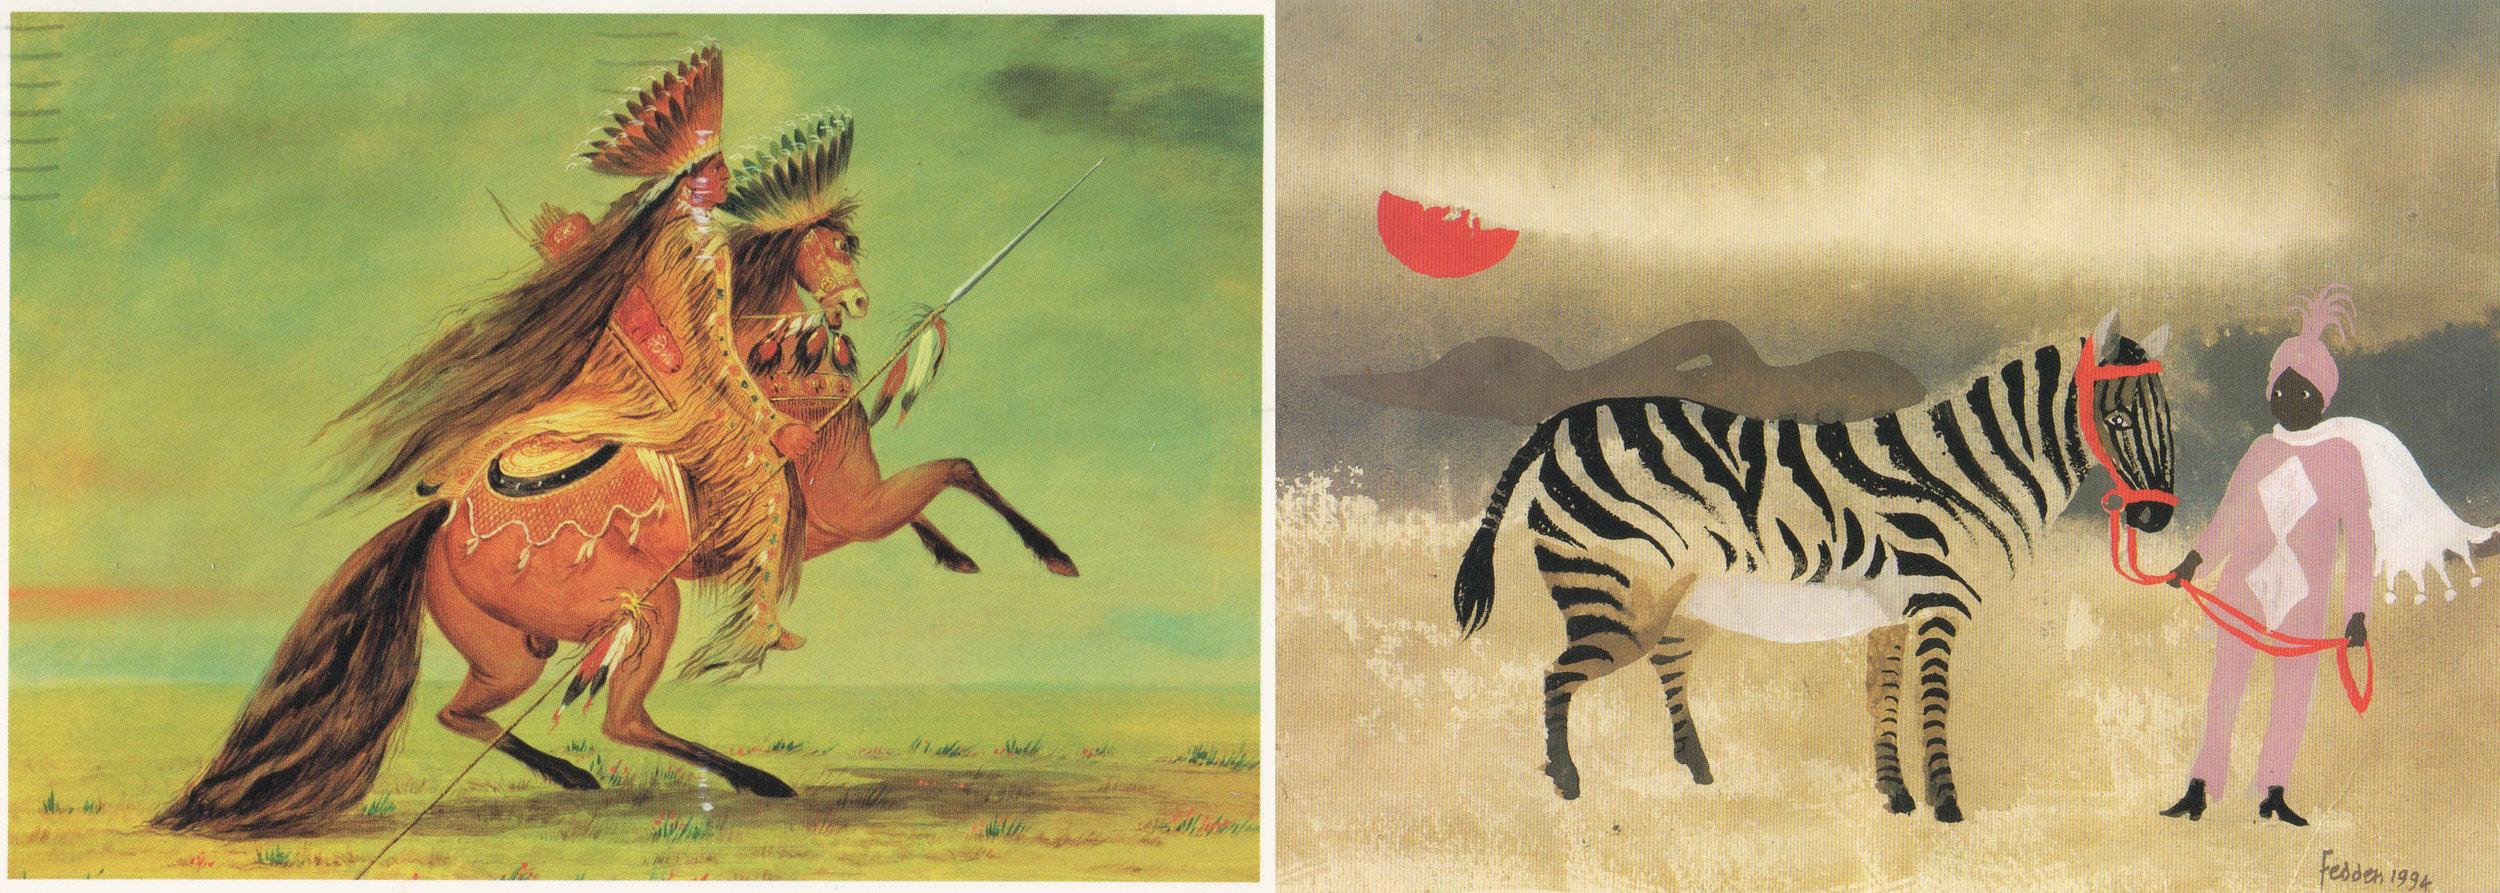 Crow Chief -George Catlin                          Zebra - Mary Fedden